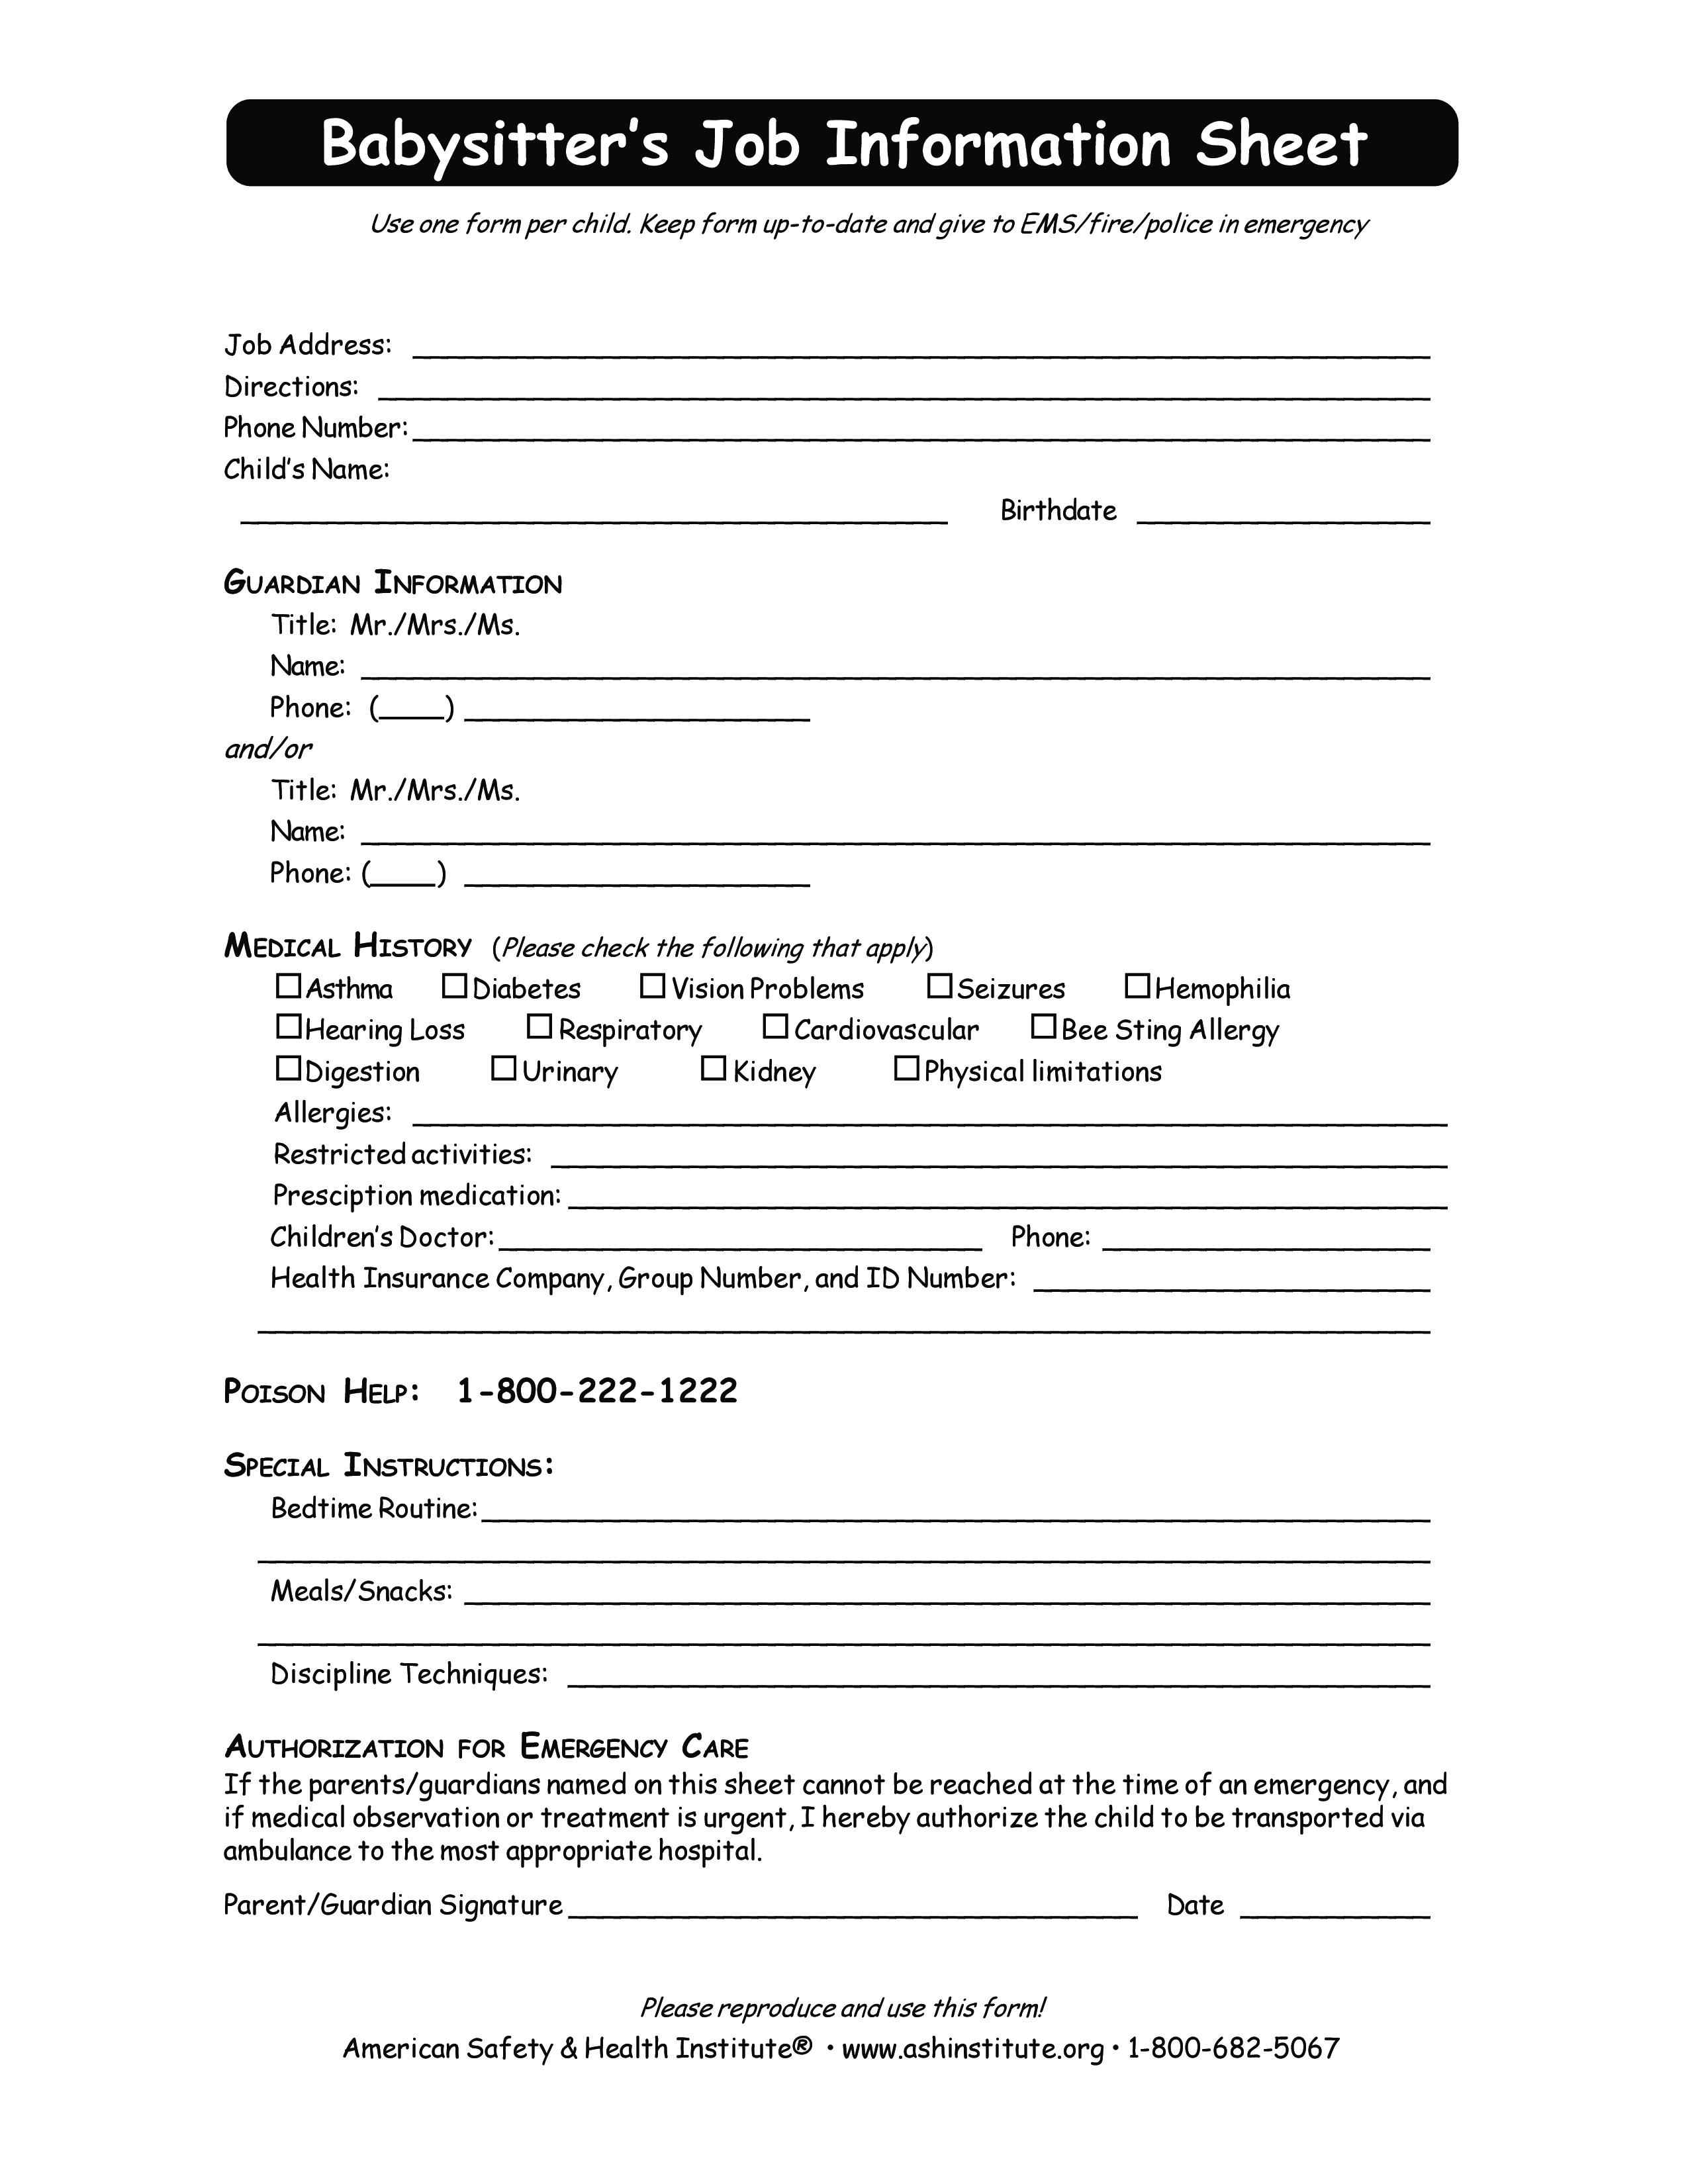 Free Babysitter Job Information Sheet Templates At